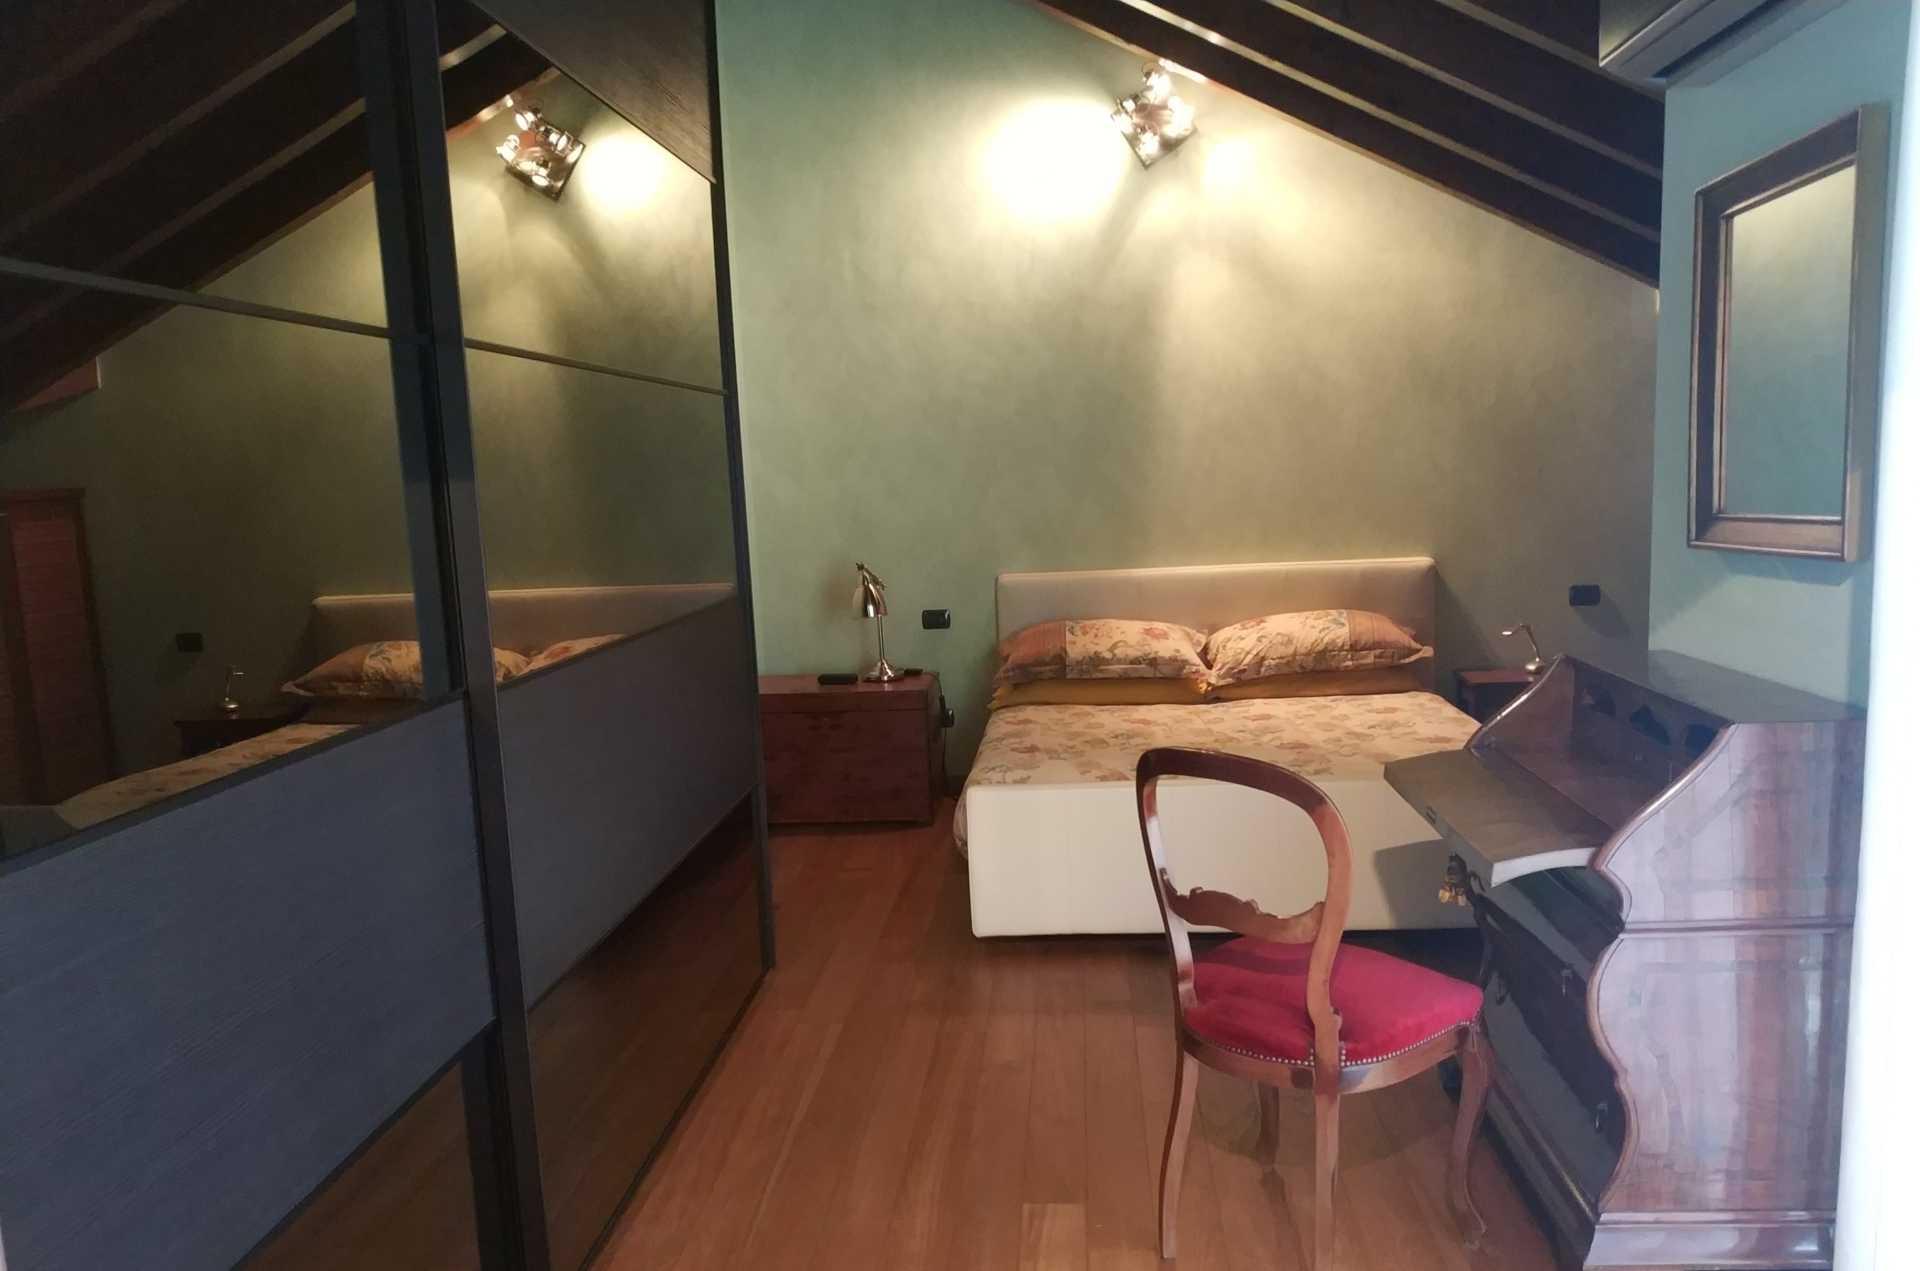 3 locali in vendita a cavenago brianza (2)